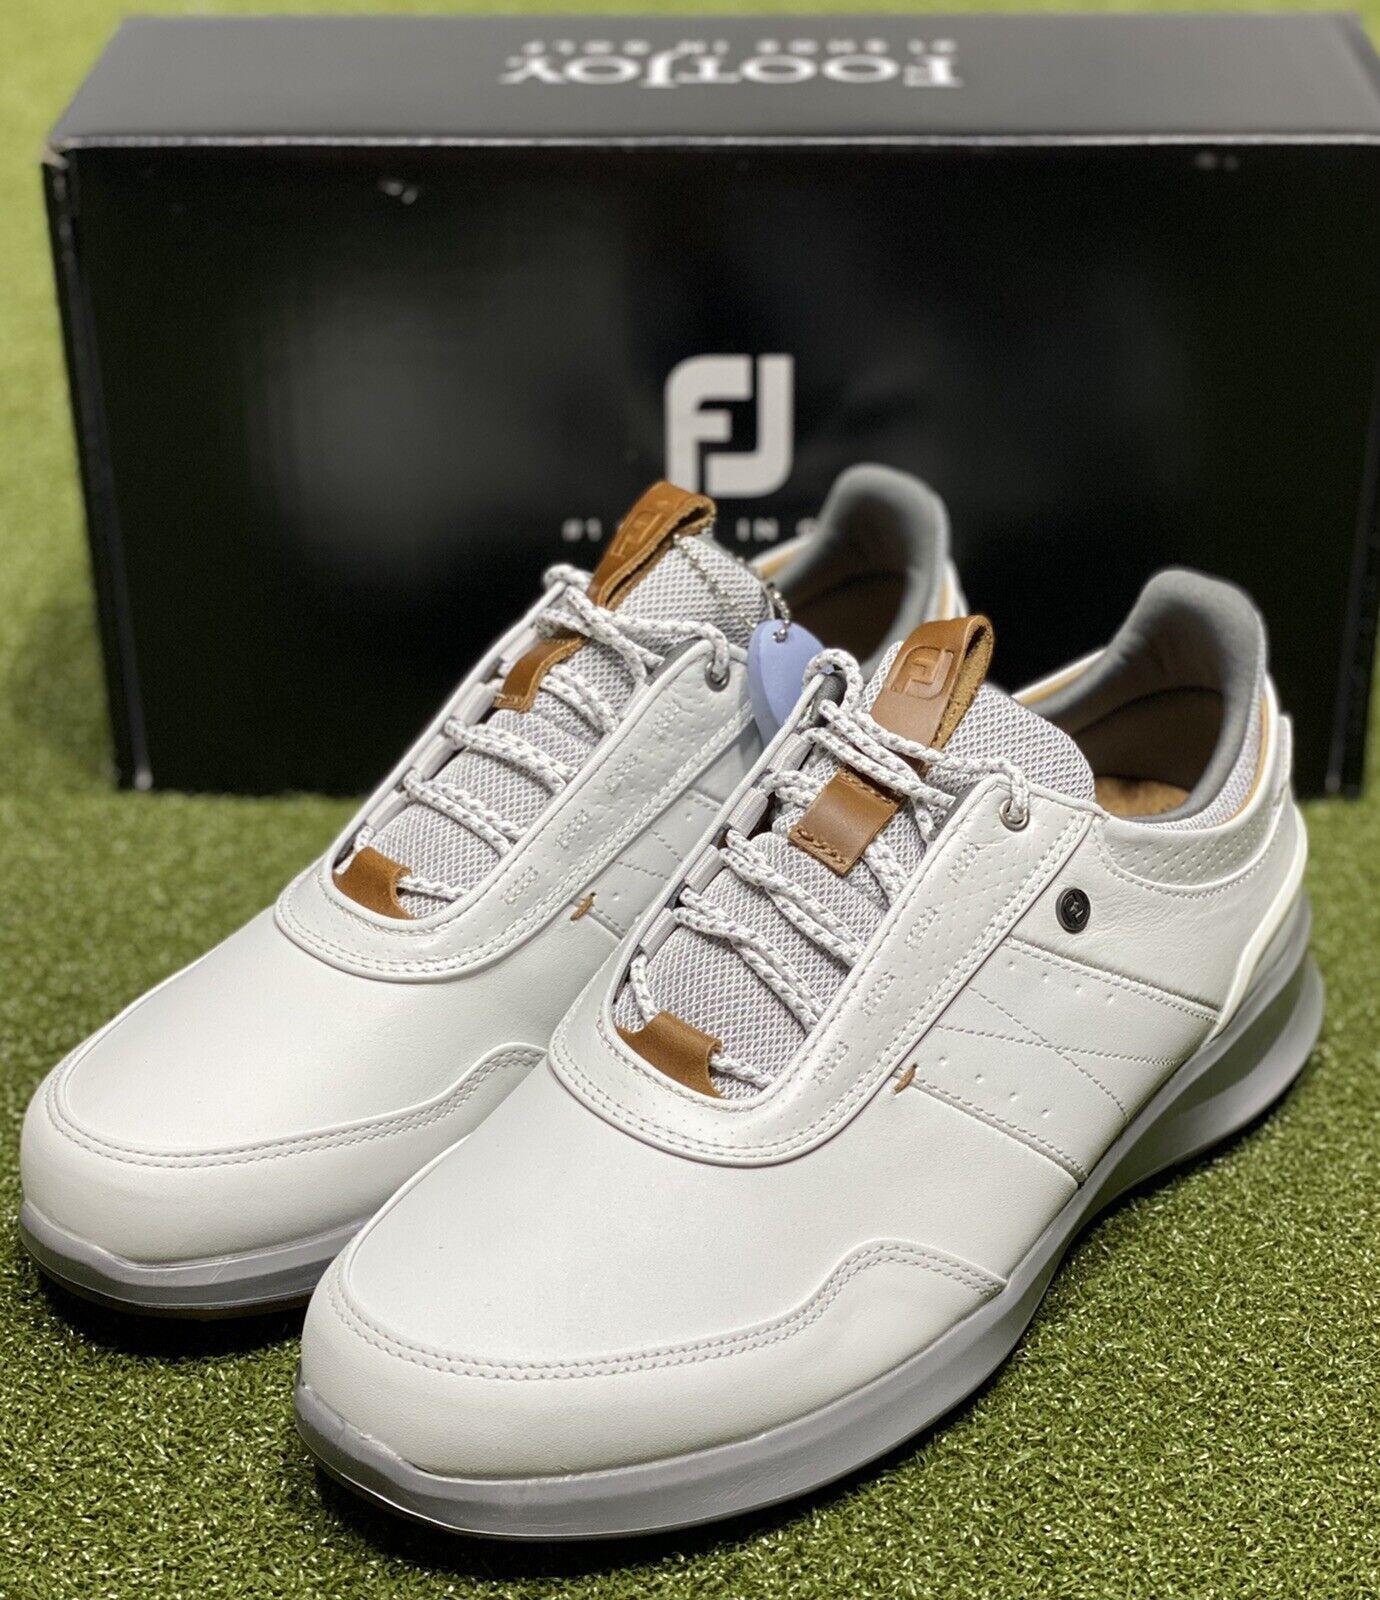 FootJoy Stratos Men s Leather Golf Shoes 50012 White 9.5 Medium D NEW 86087 - $199.95